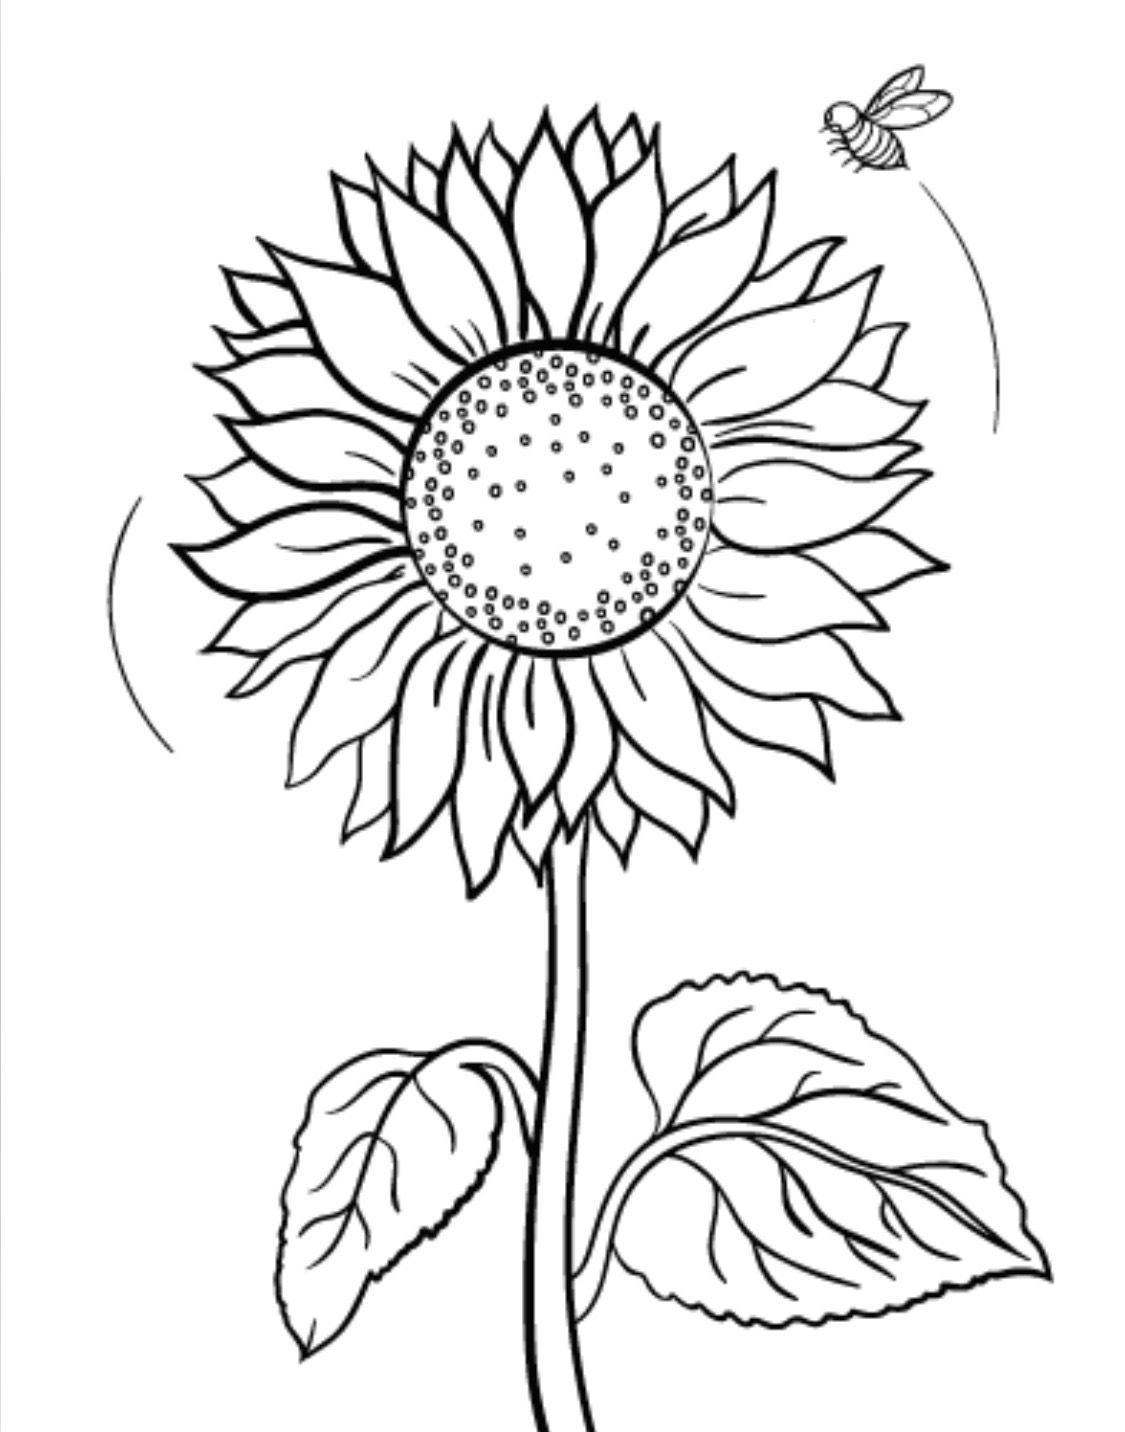 Sunflower Coloring Page Desenho Do Girassol Flores Para Colorir Desenhos Para Colorir